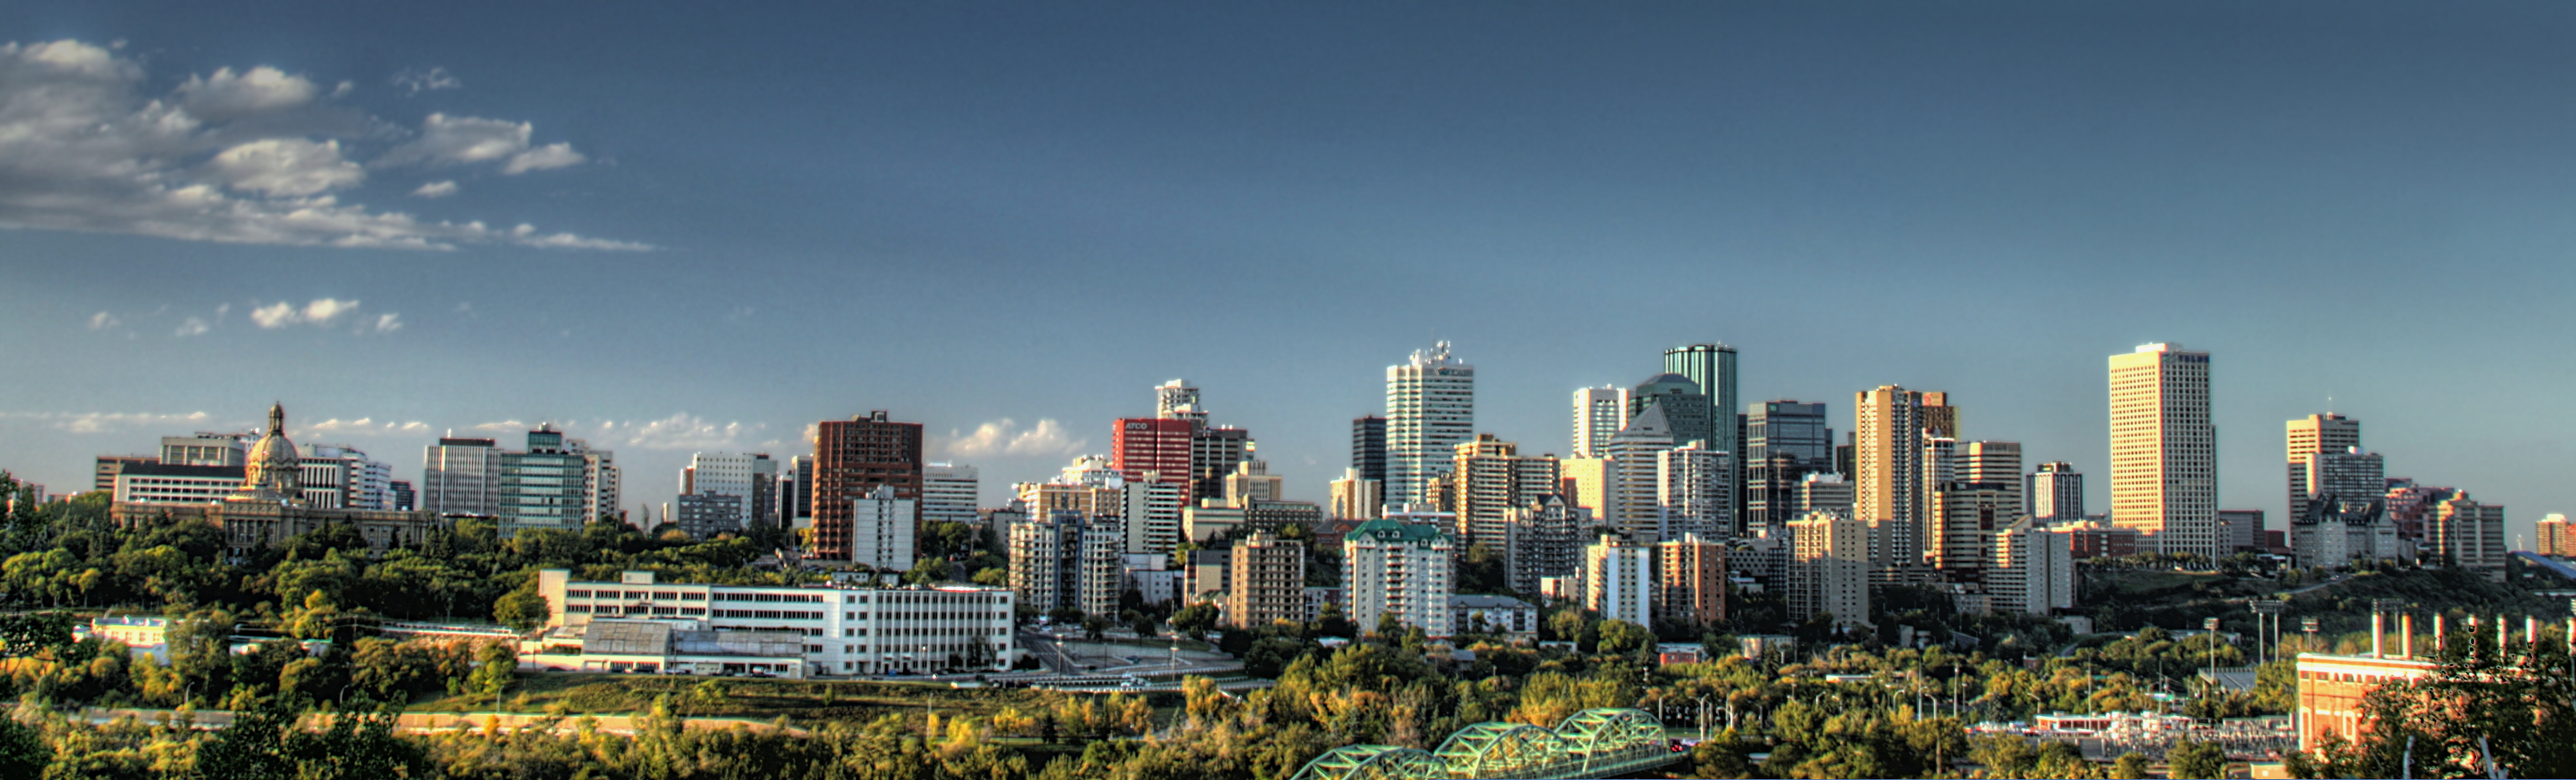 Downtown-Skyline-Edmonton-Alberta-Canada-01A.jpg